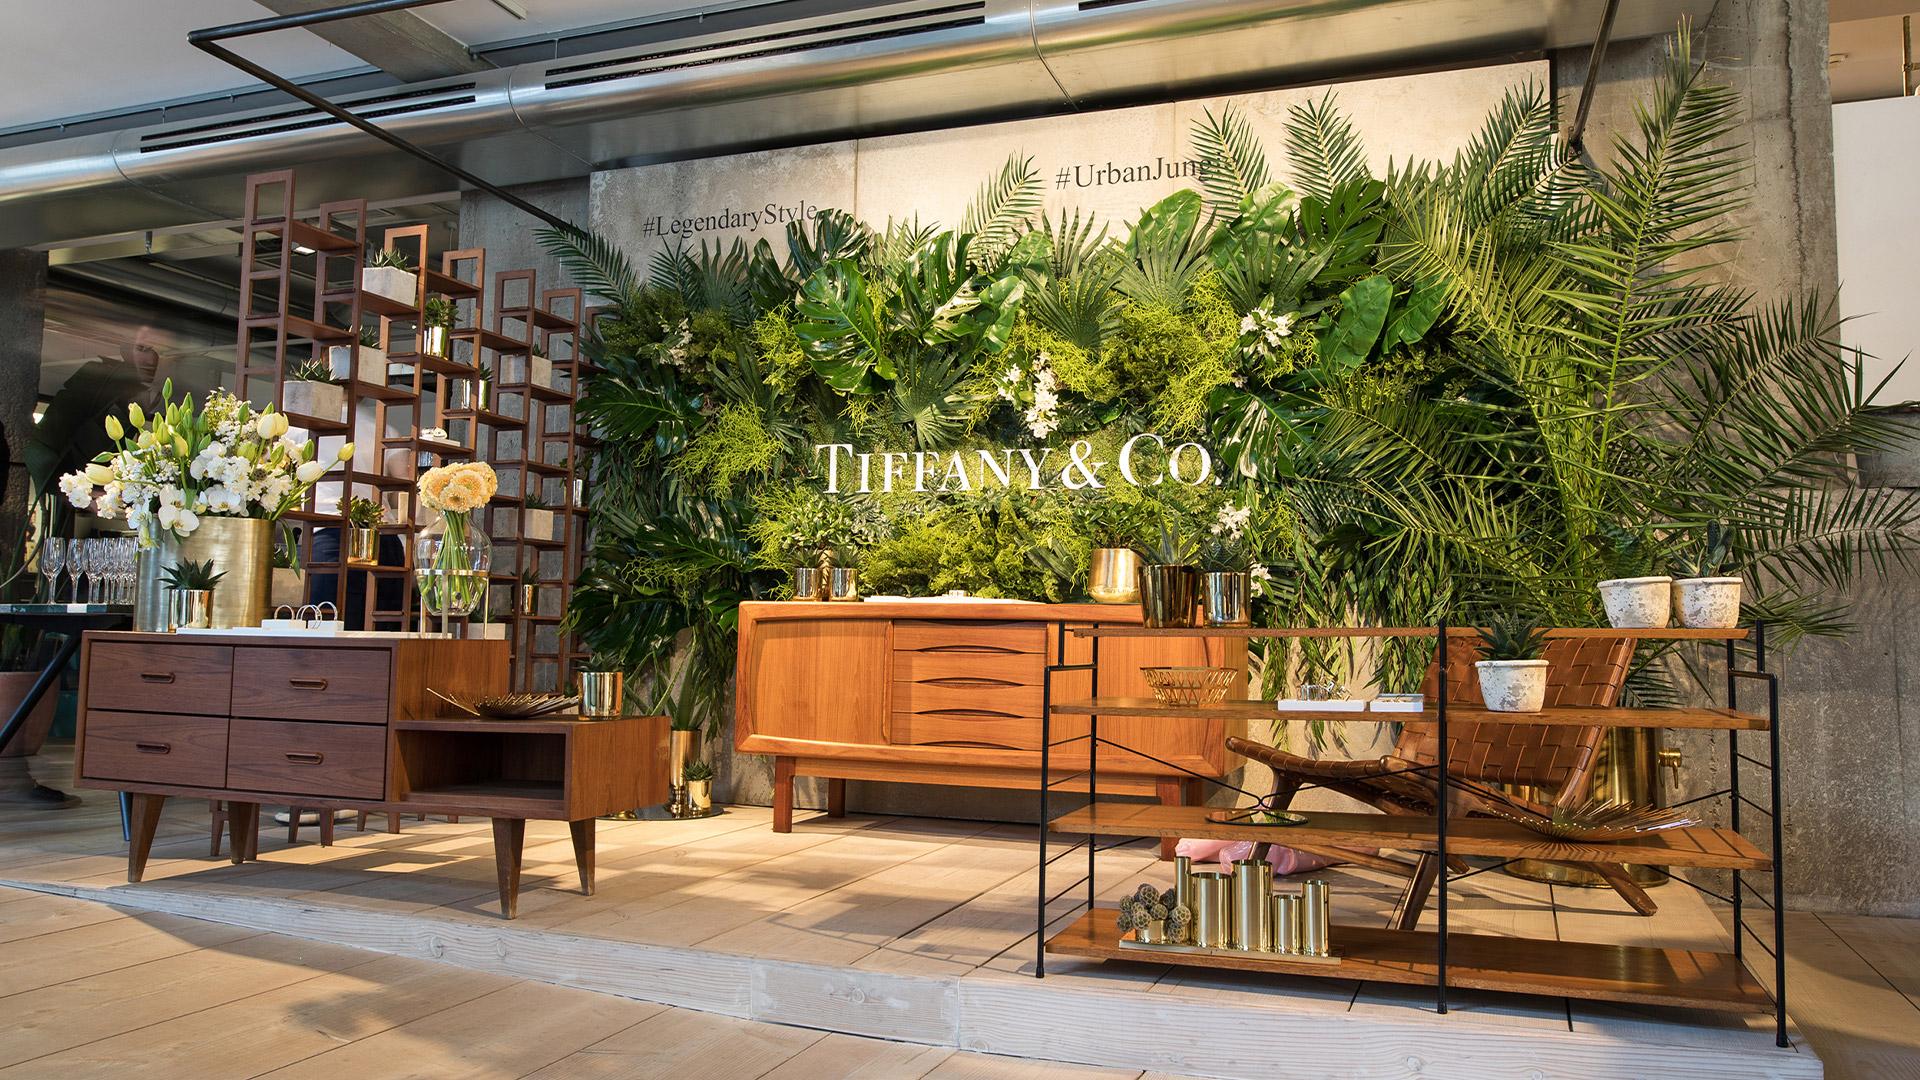 LIGANOVA   Tiffany & Co.   Brand Experience – Pop-Up Space